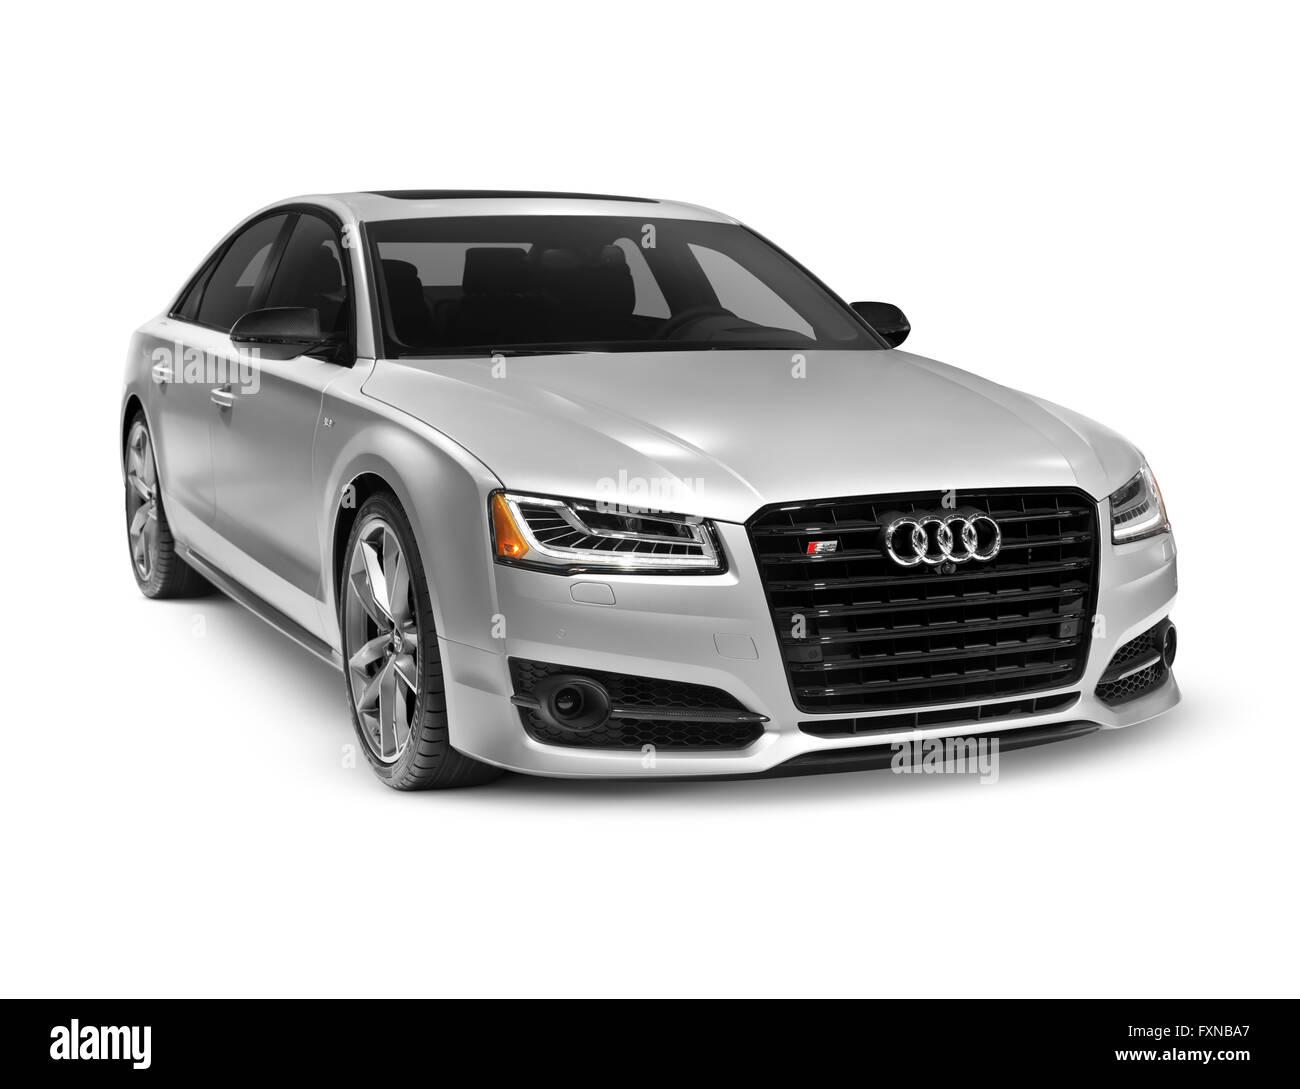 Audi s8 plus white dress